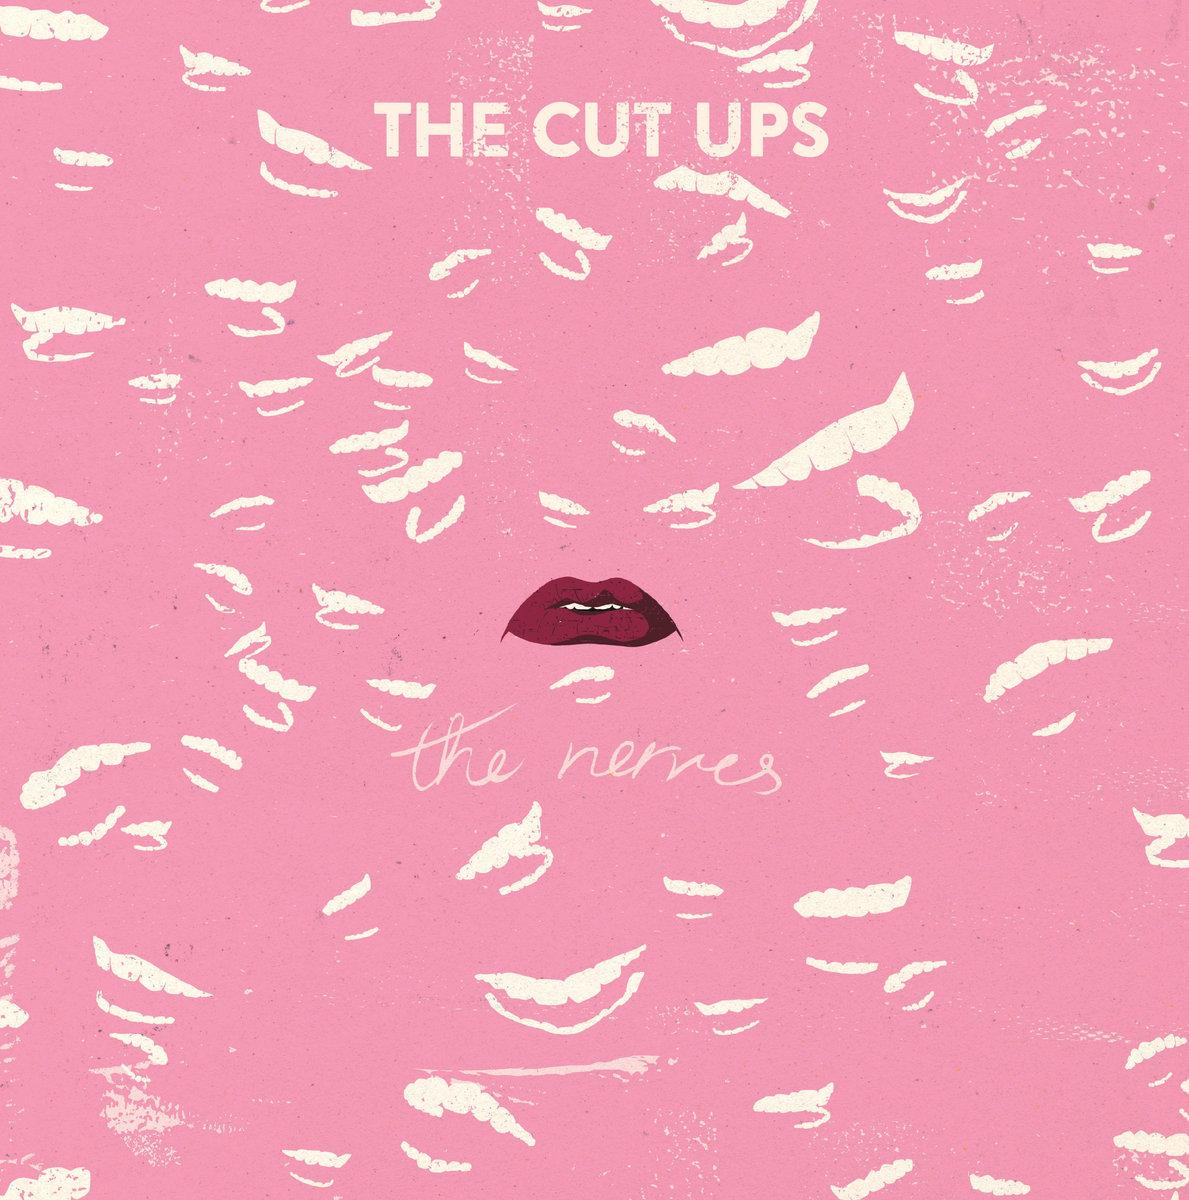 The Cut Ups - The Nerves LP/CD